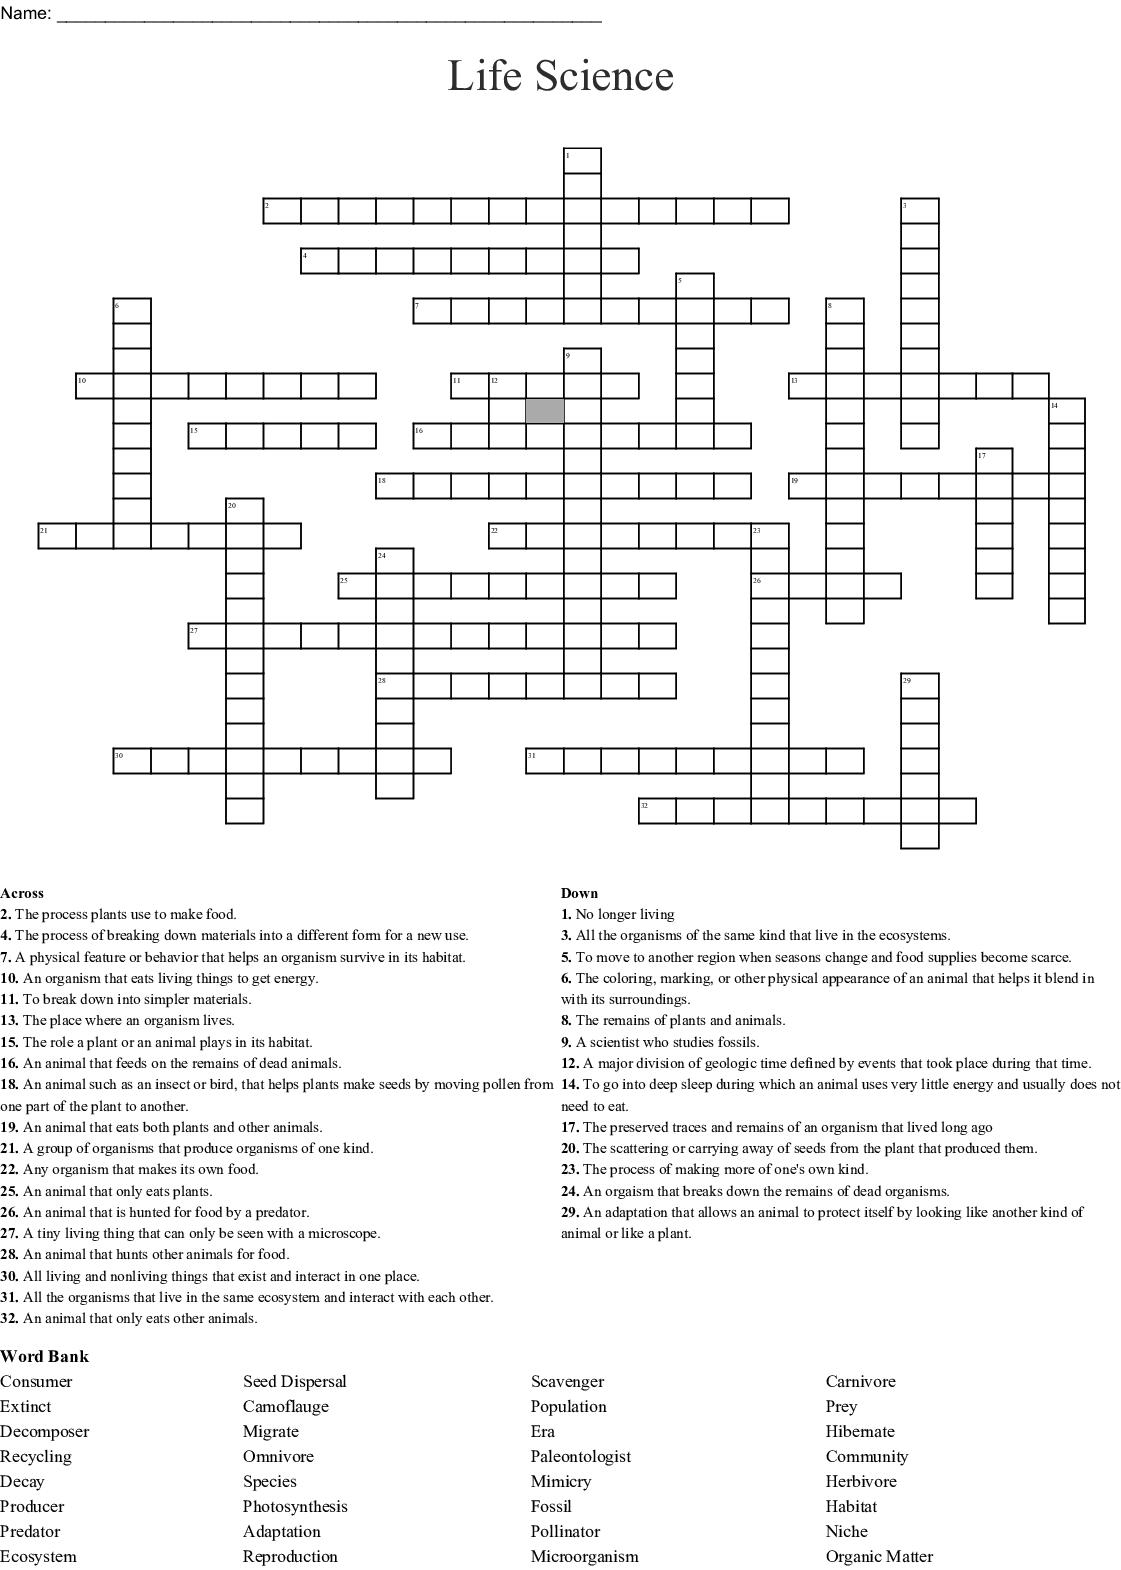 Habitat Amp Conservation Crossword